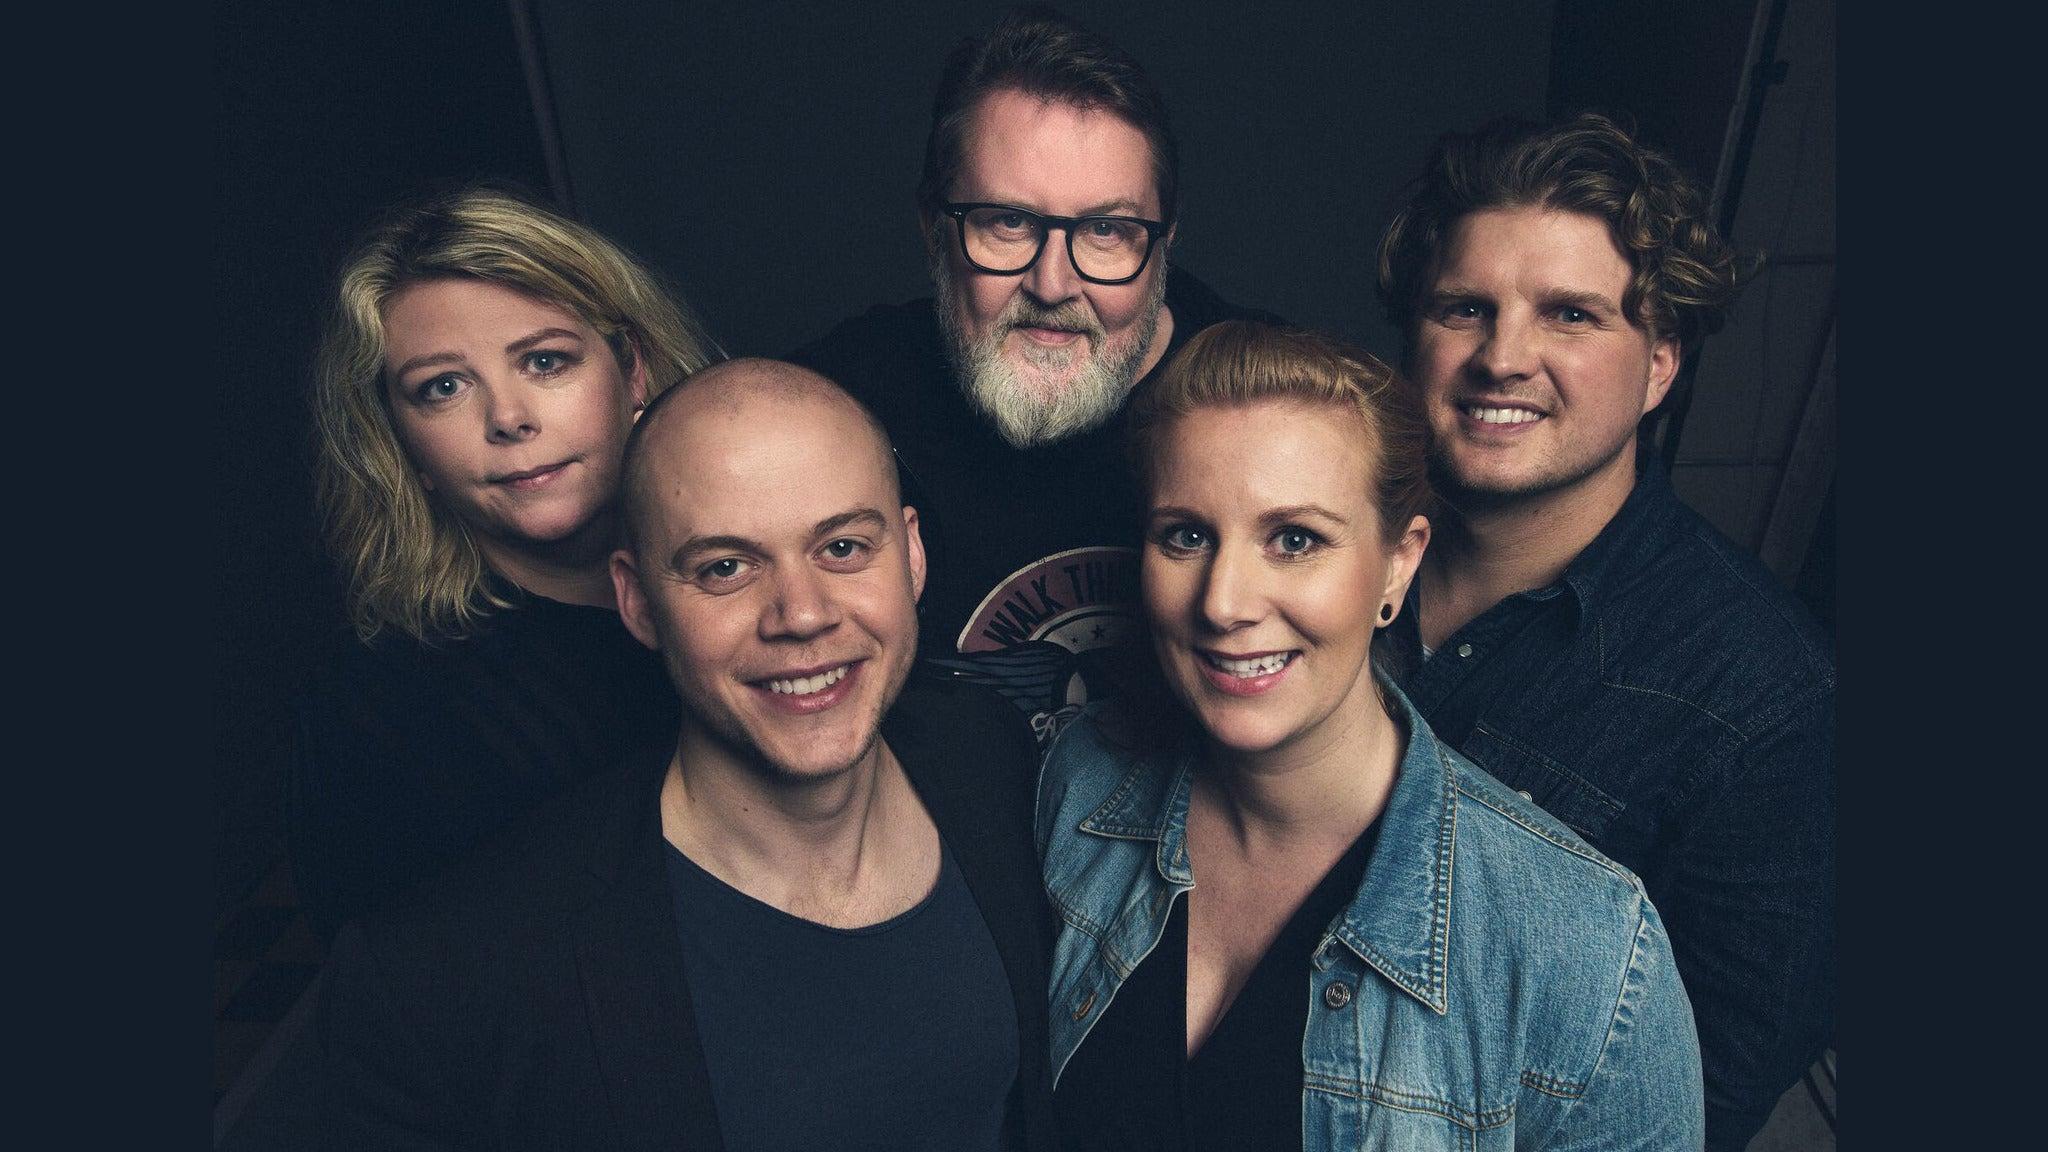 Alex Nyborg Madsen & A Circle Of Friends